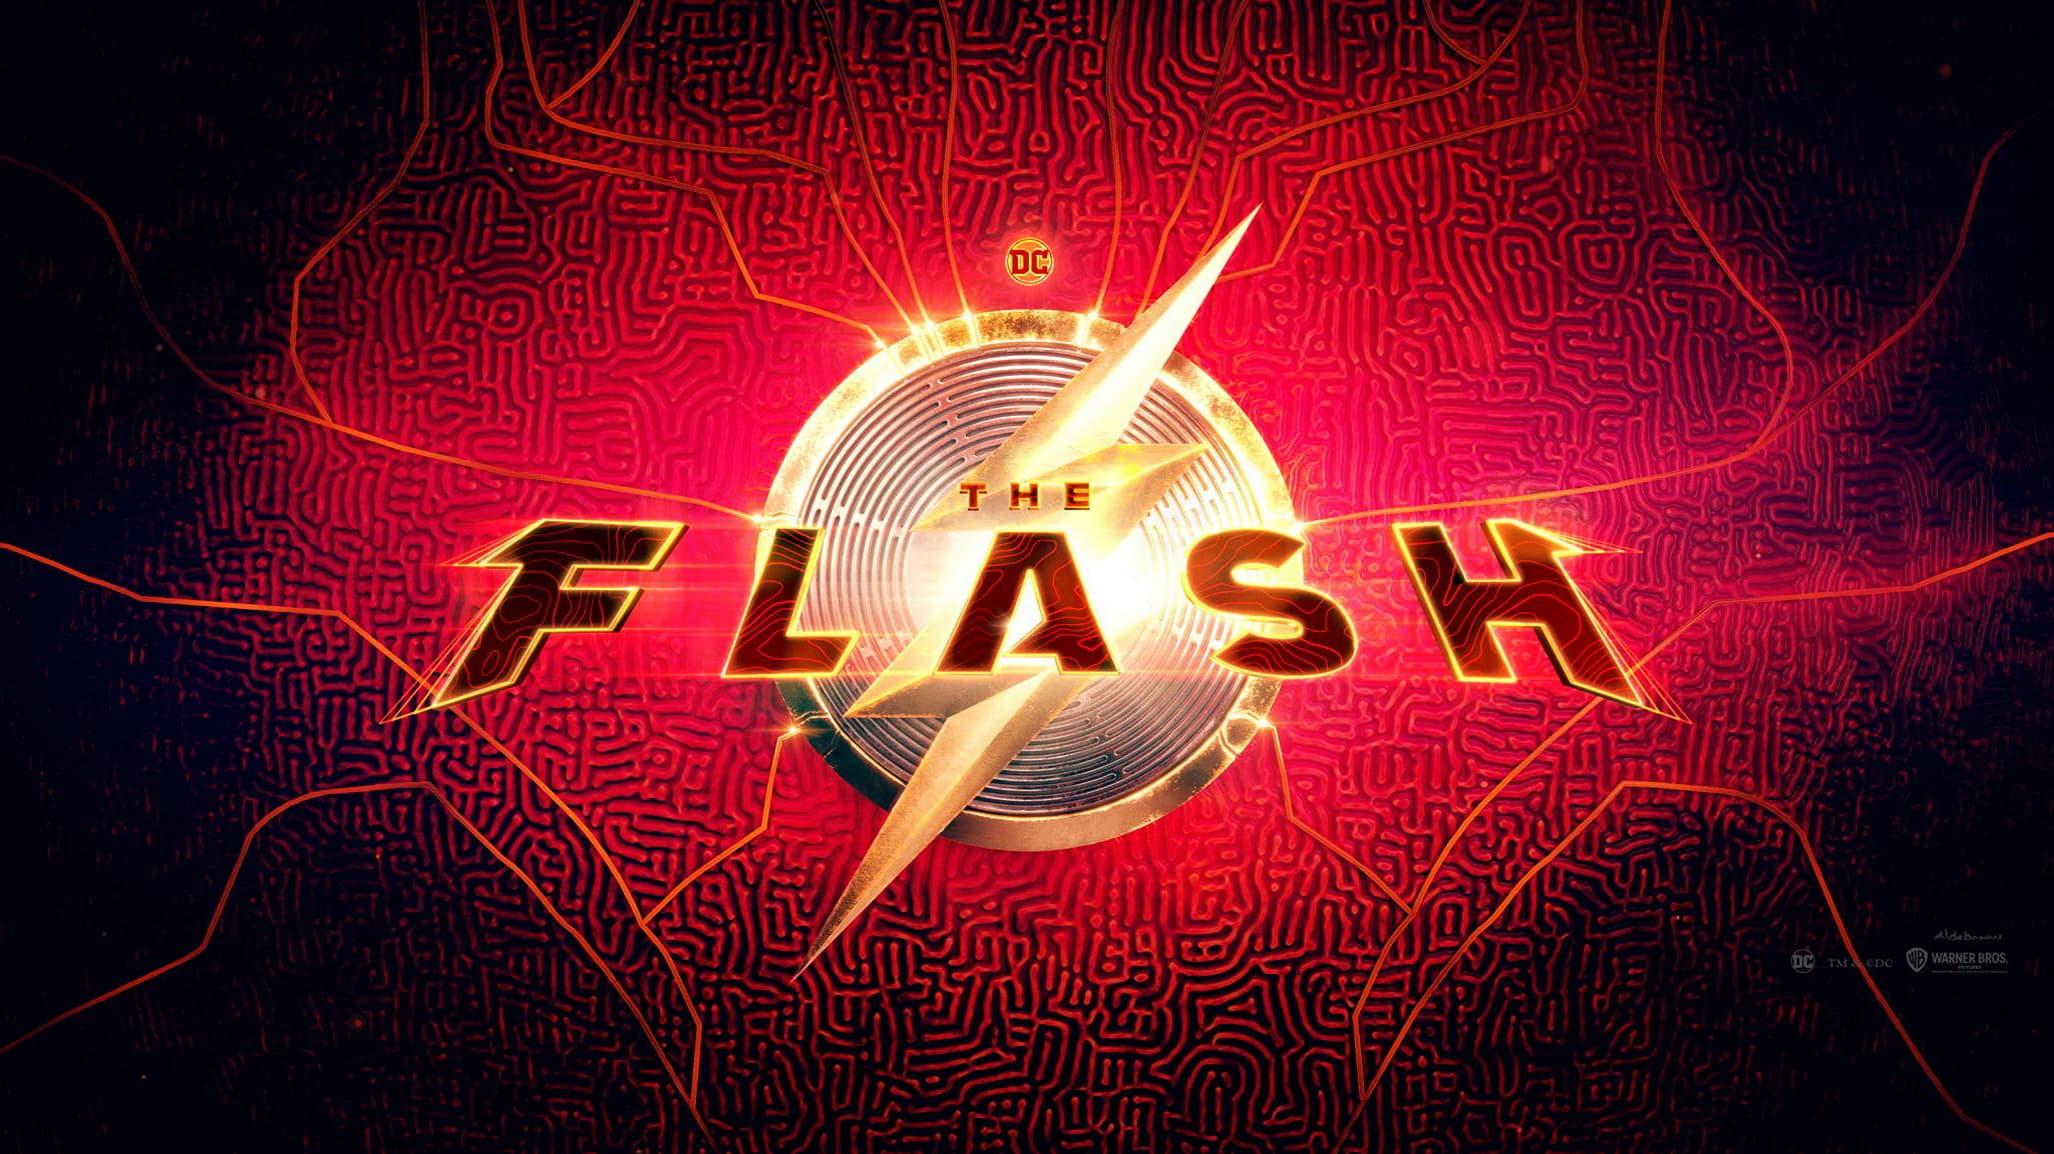 The Flash (2022)